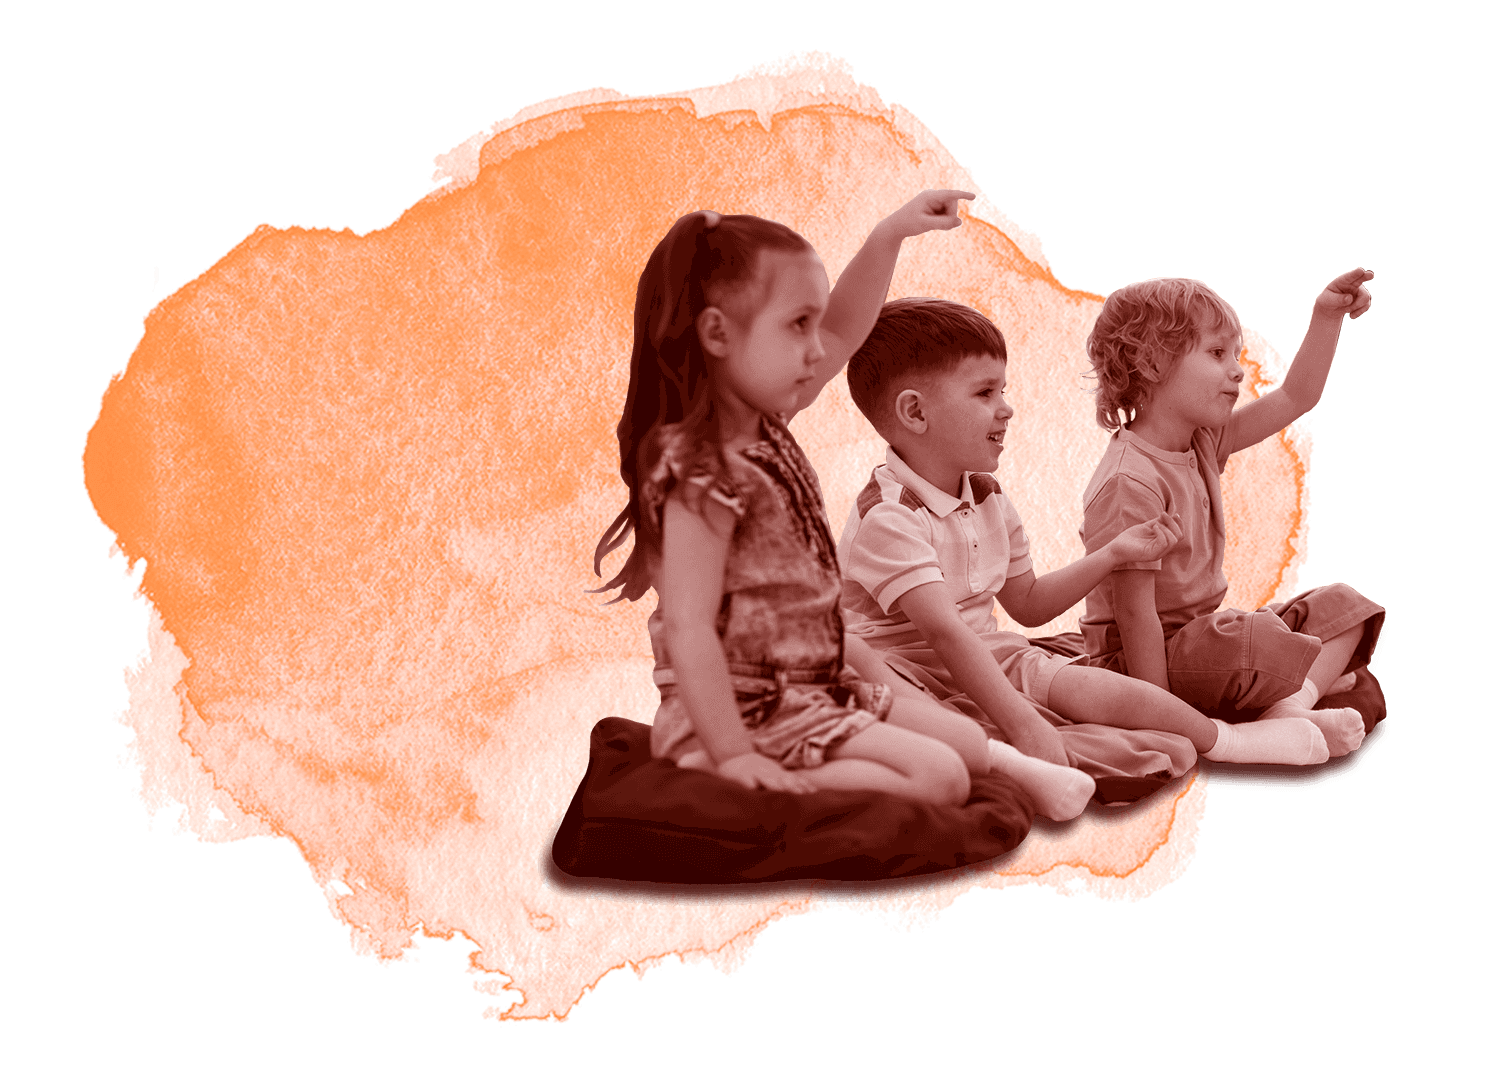 Three preschool children in class